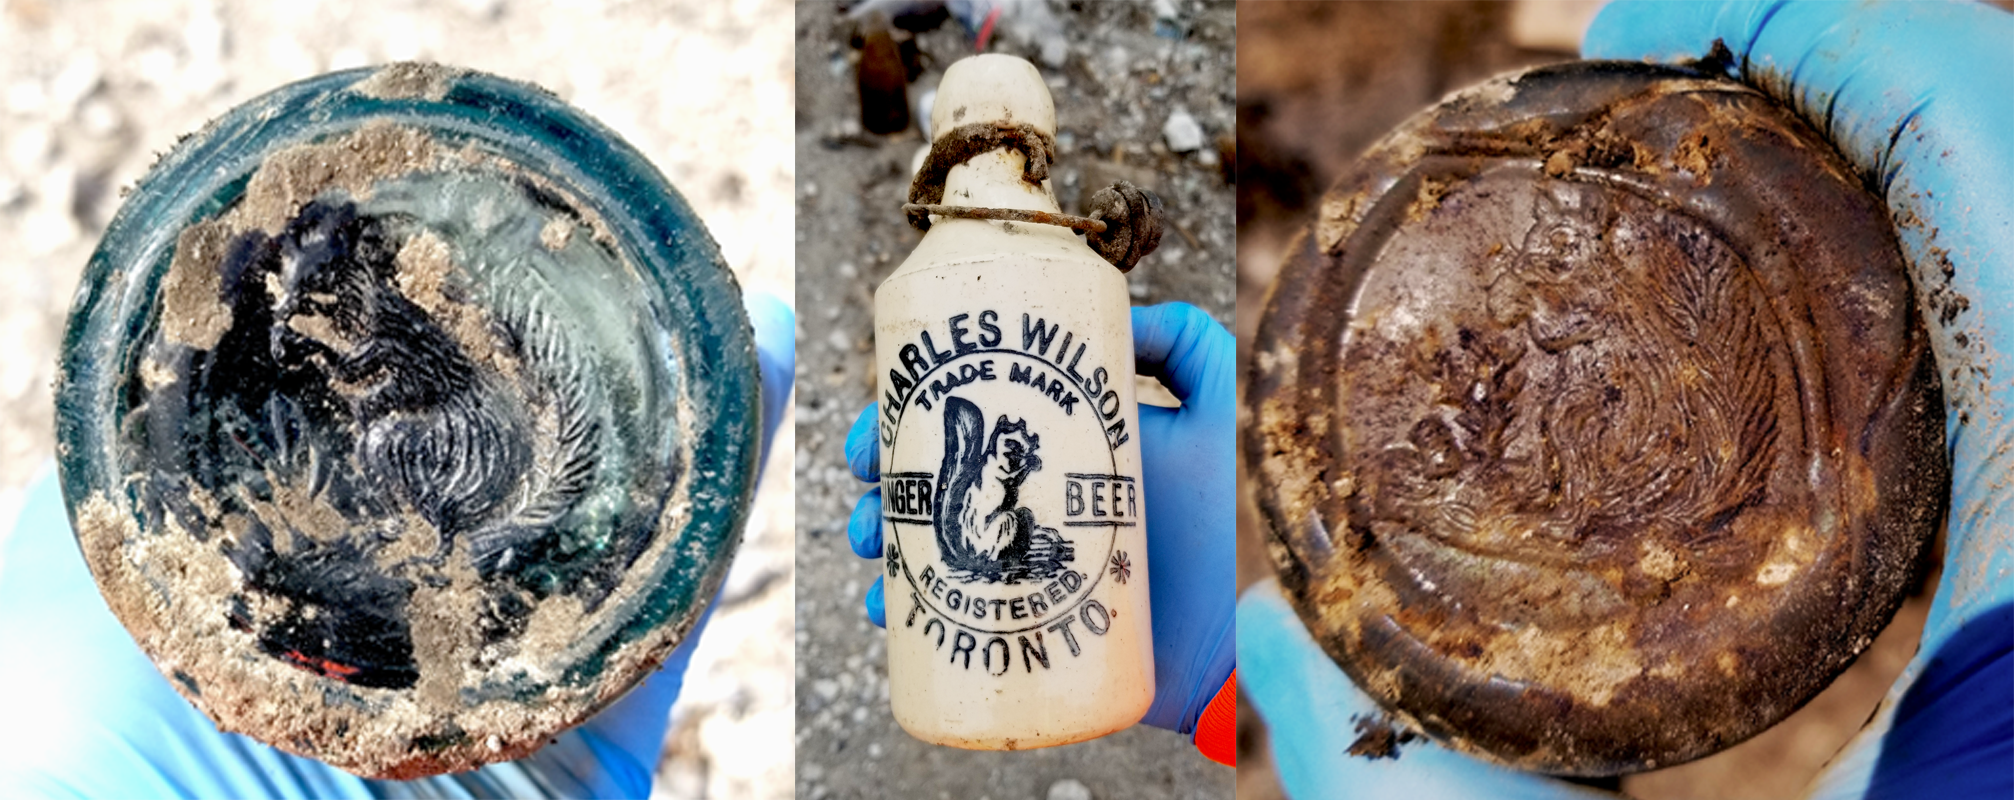 Three bottles found in the Port Lands, each showing Charles's Wilson's squirrel trademark.